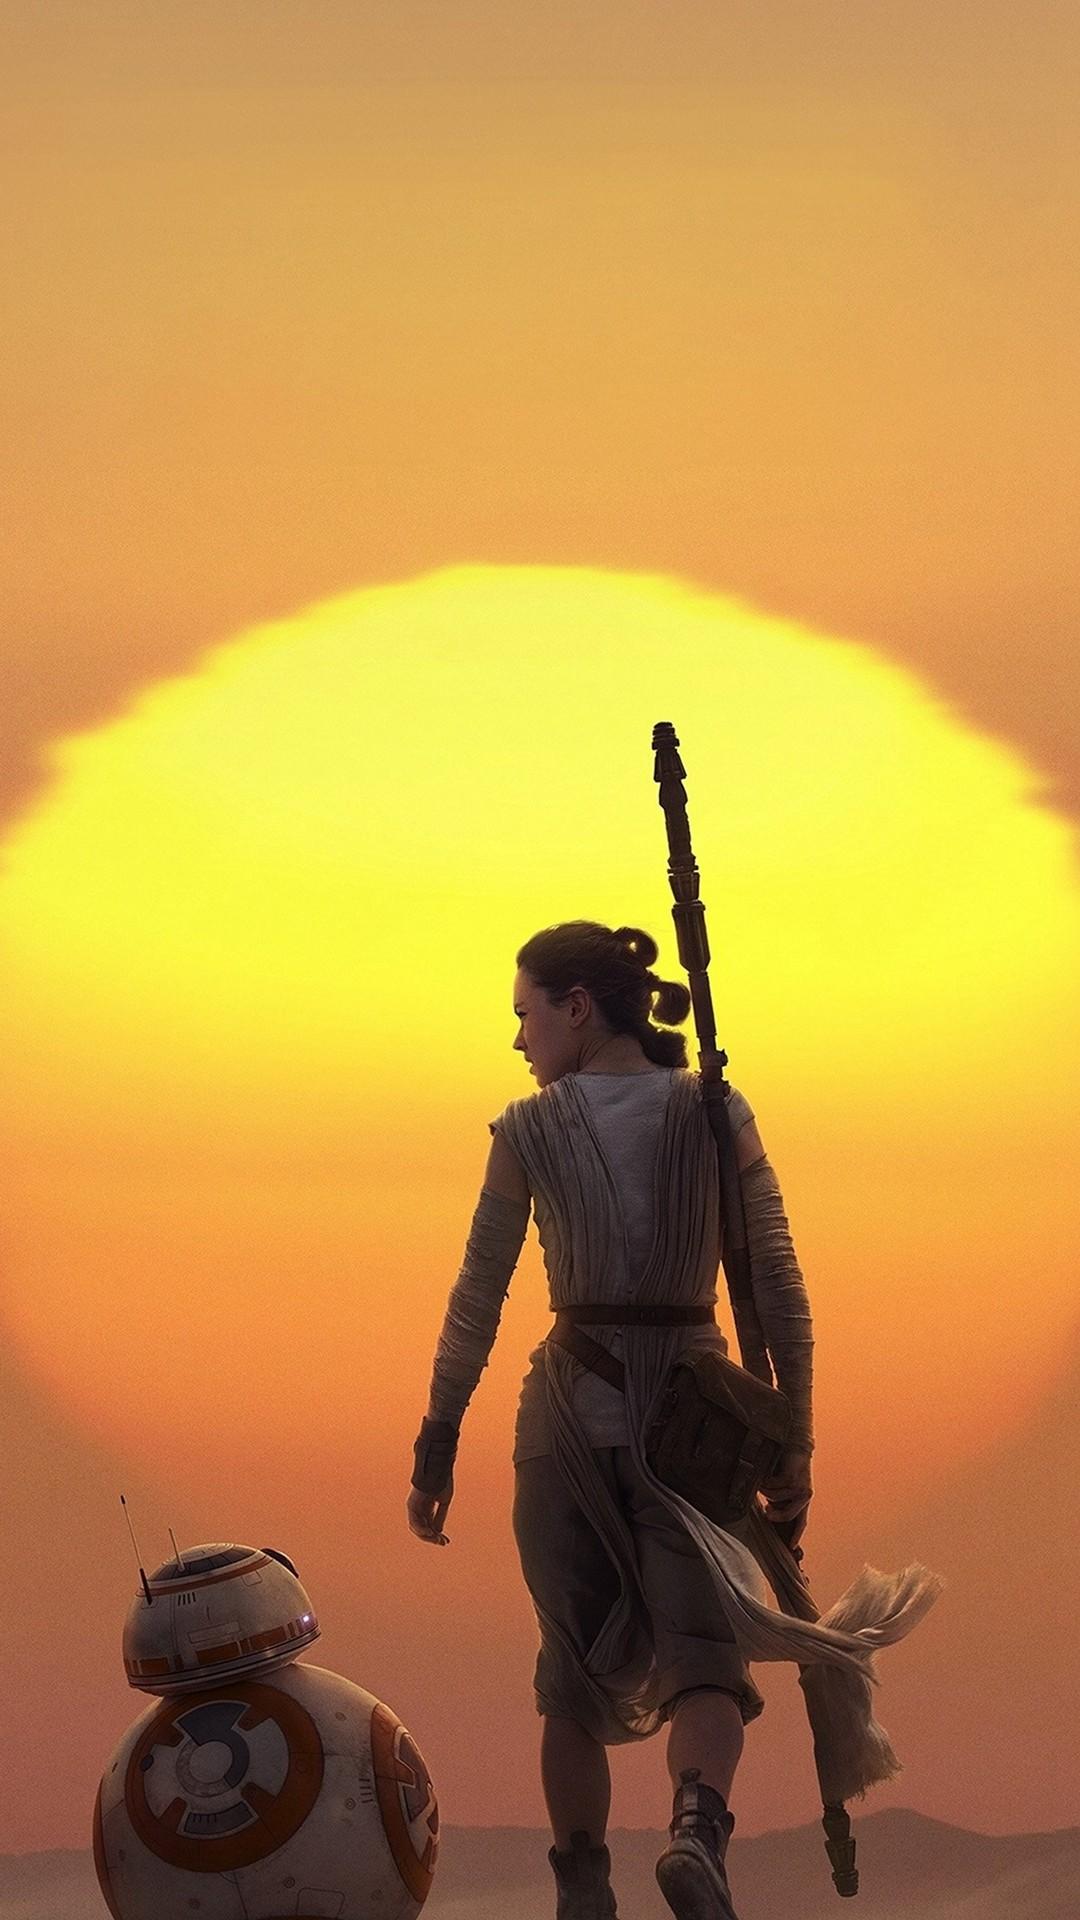 Star Wars Desktop Wallpaper Dump – https://imgur.com/gallery/arXmv